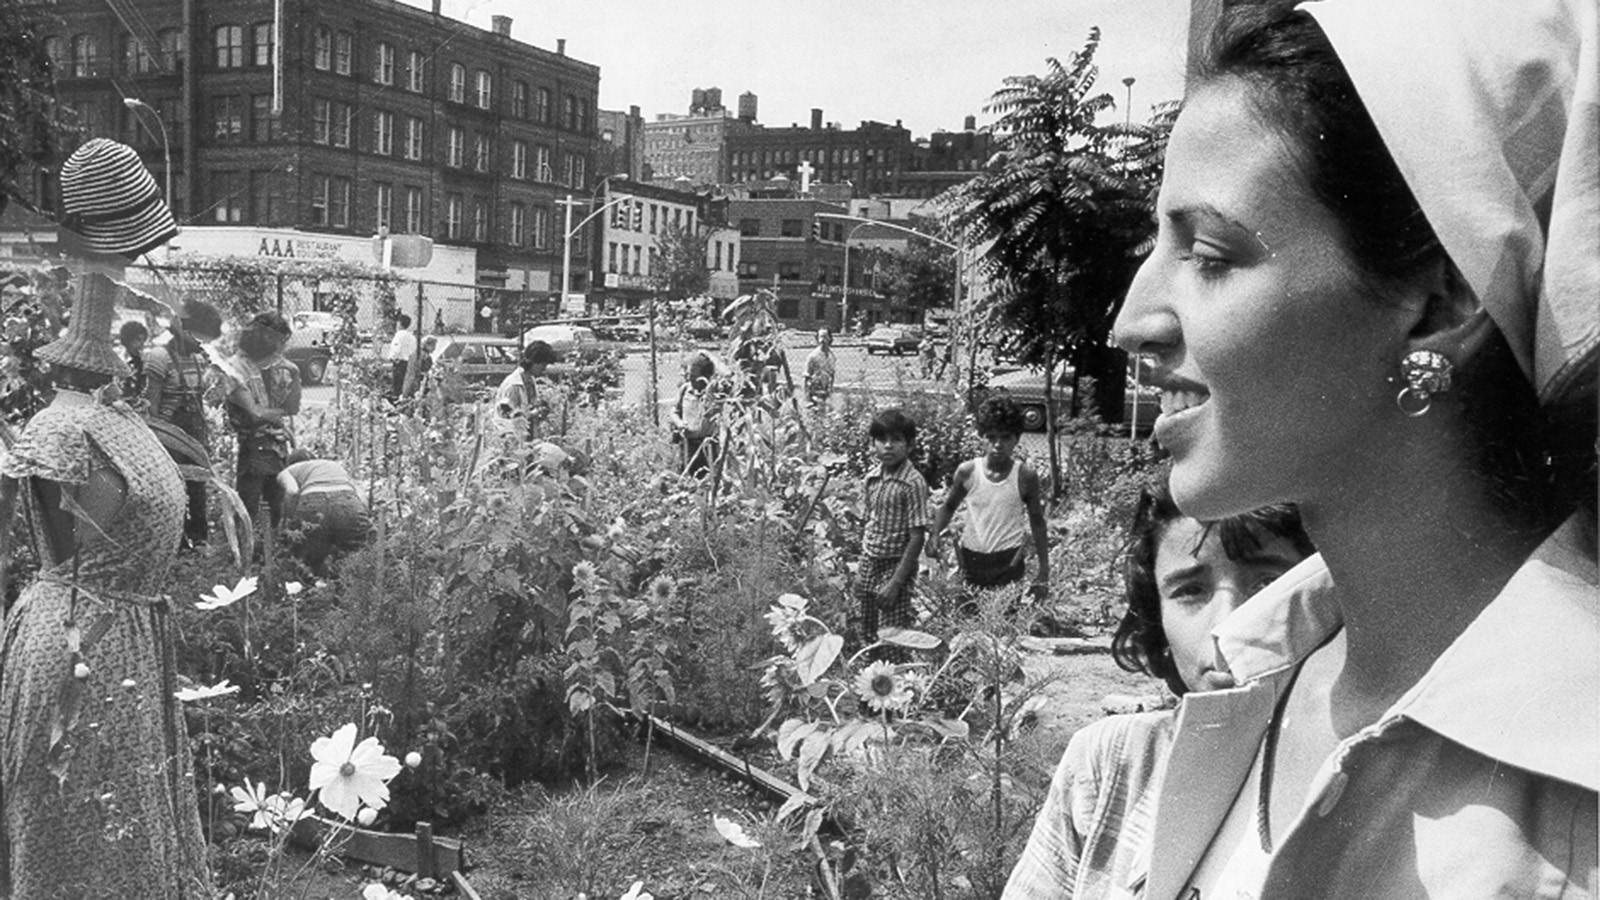 New York and the radical gardener - Sheet4